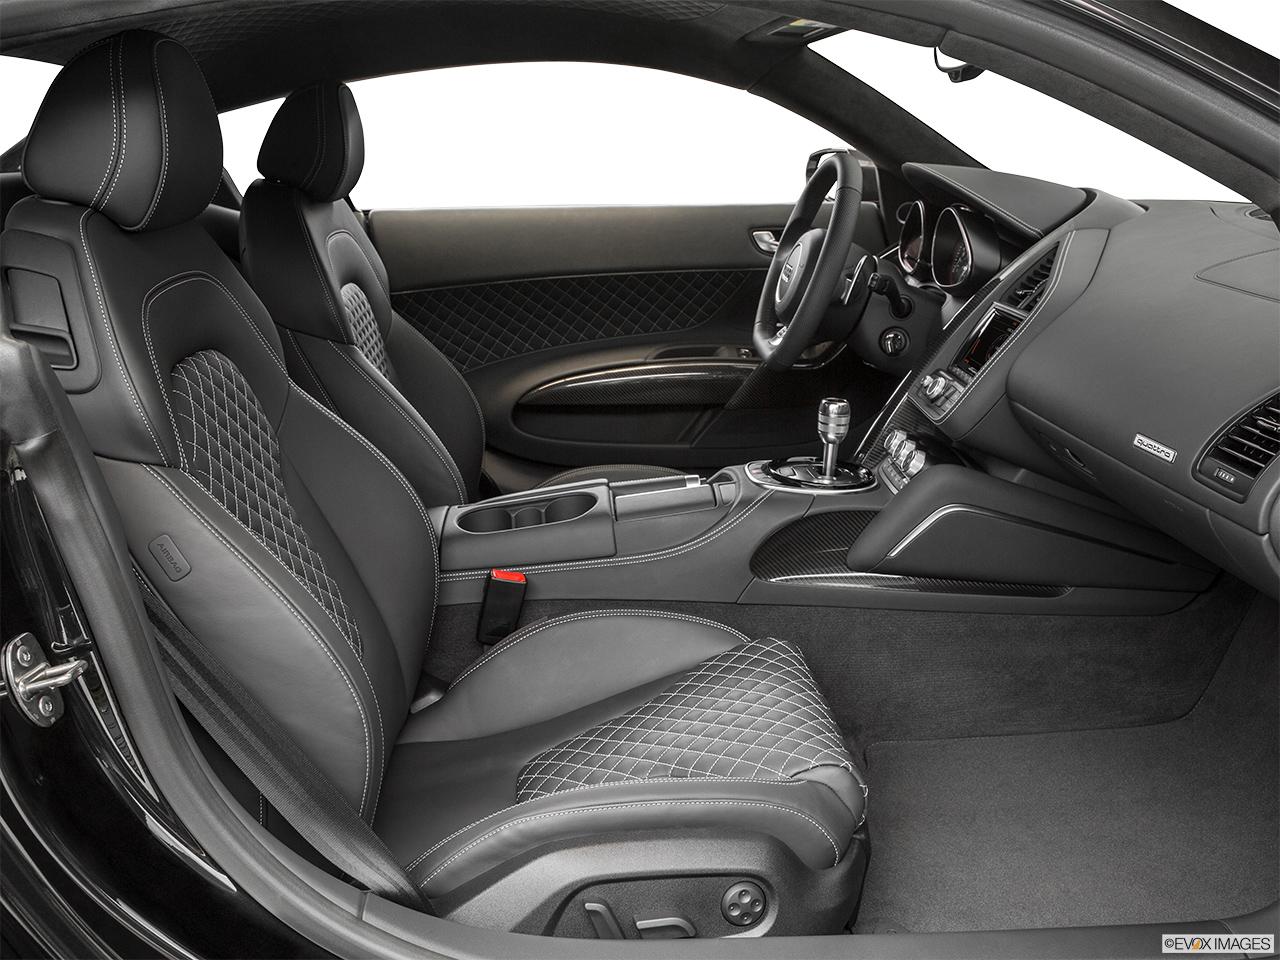 2015 audi r8 conv manual quattro spyder v8 front angle view rh carnow com Audi R8 Automatic Audi R8 Manual Transmission